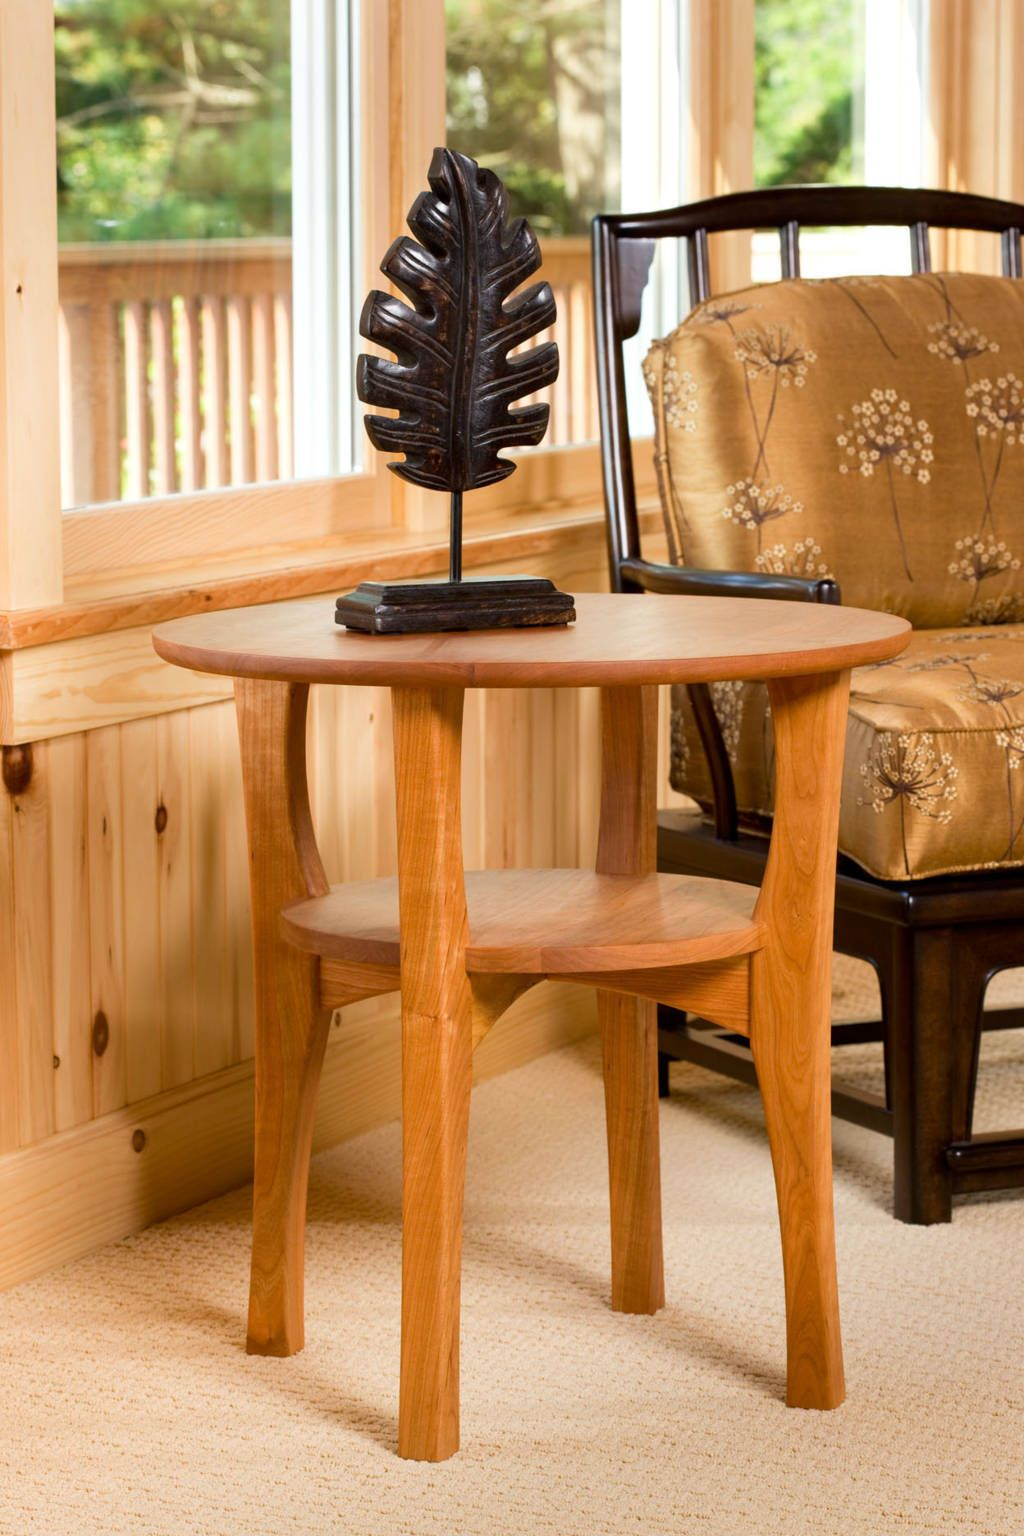 Etonnant Verdana Round End Table U2013 Little Homestead Living Furniture, End Tables,  Homestead, Mesas